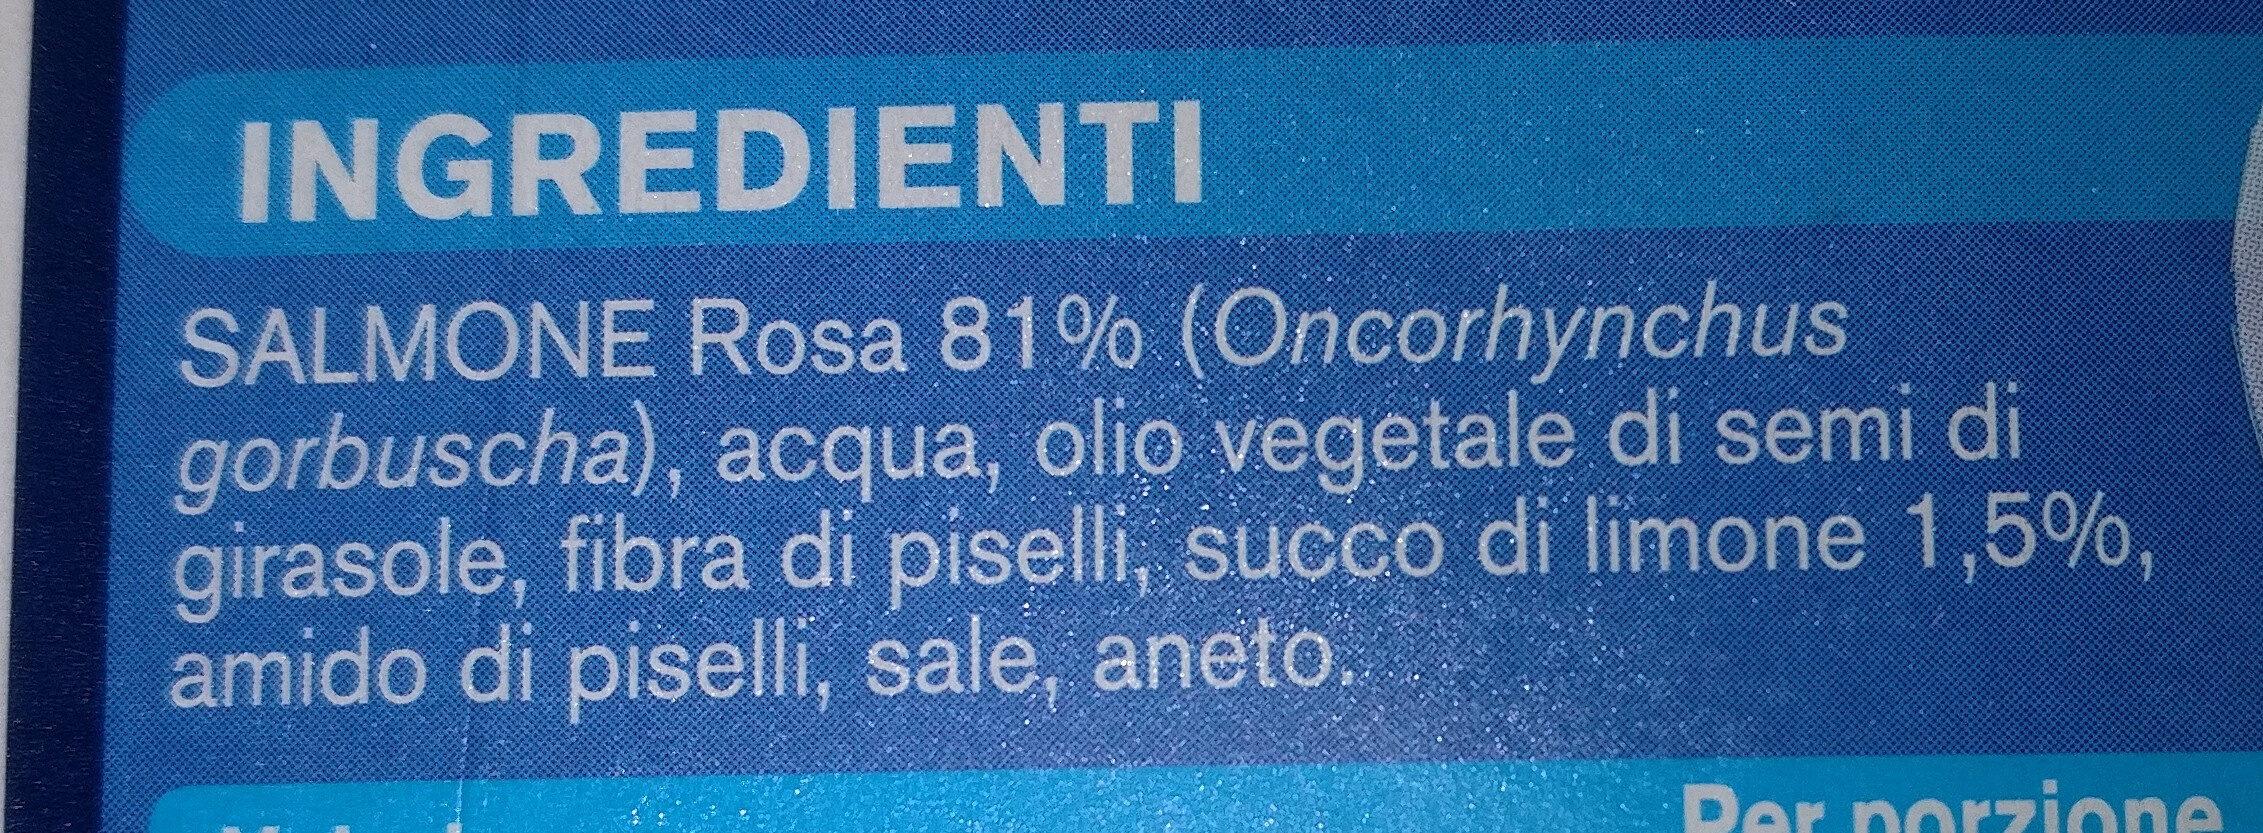 Burger di salmone - Ingrediënten - it